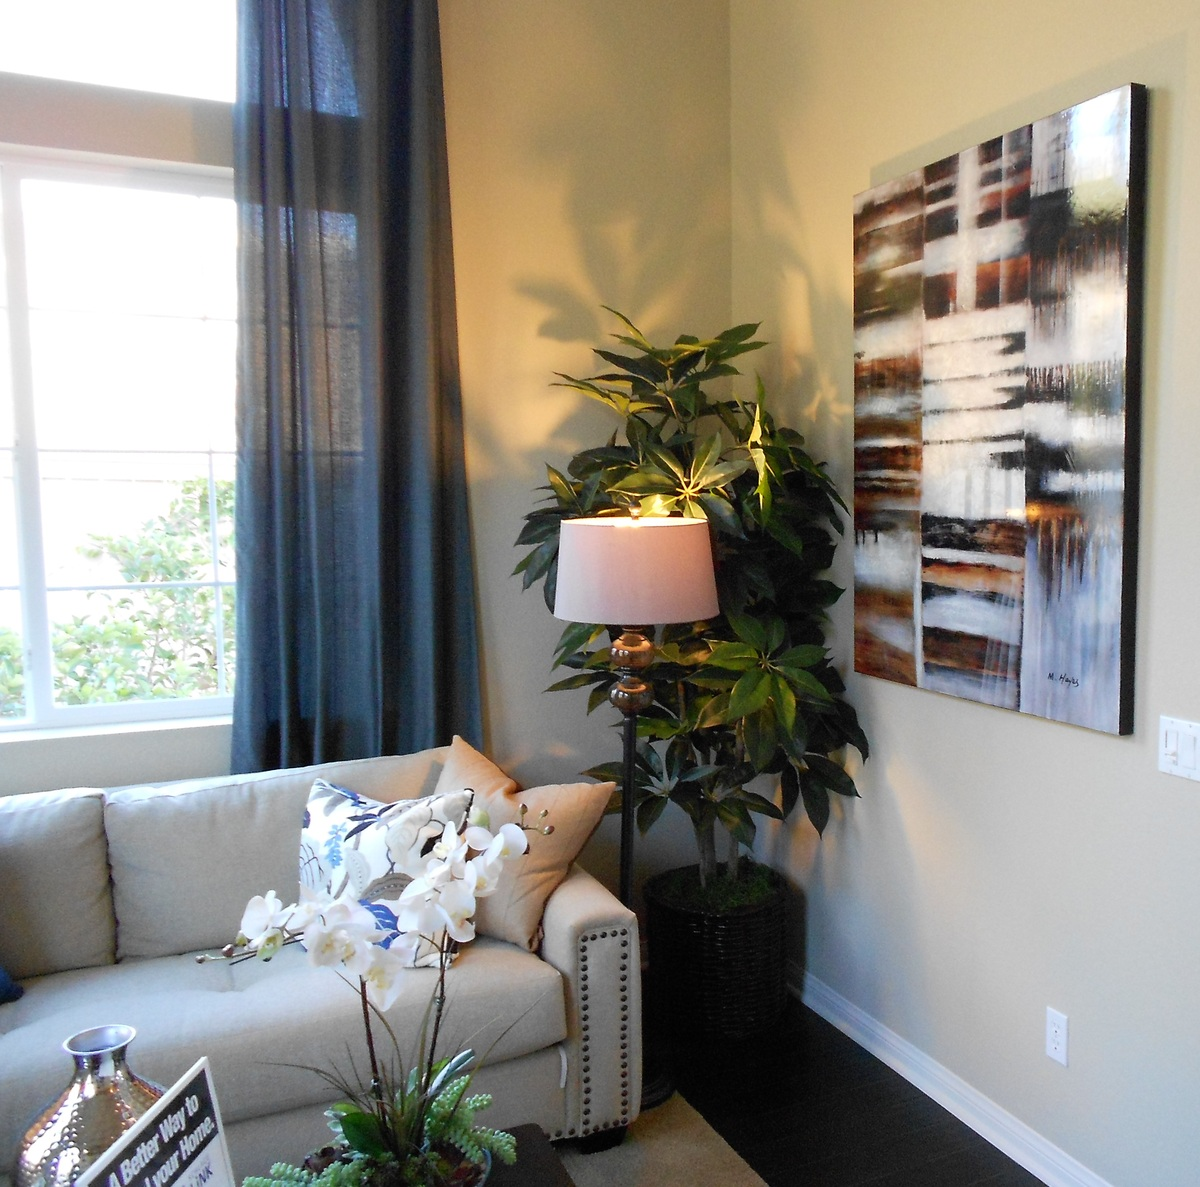 Model homes furniture sale san diego